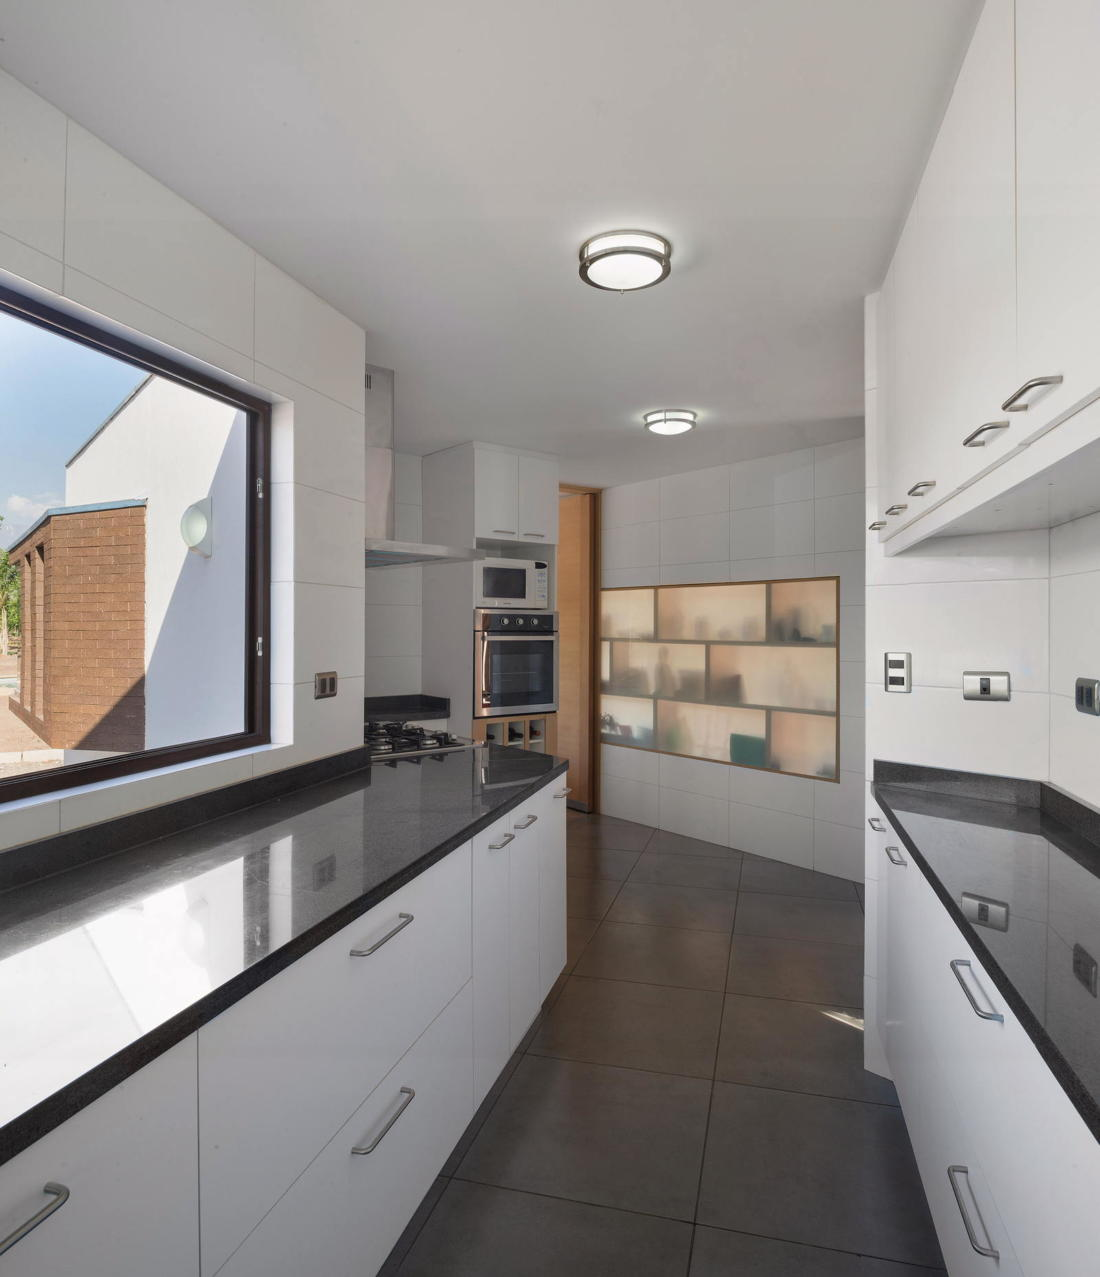 Проект студии GITC arquitectura для безопасности и комфорта 10